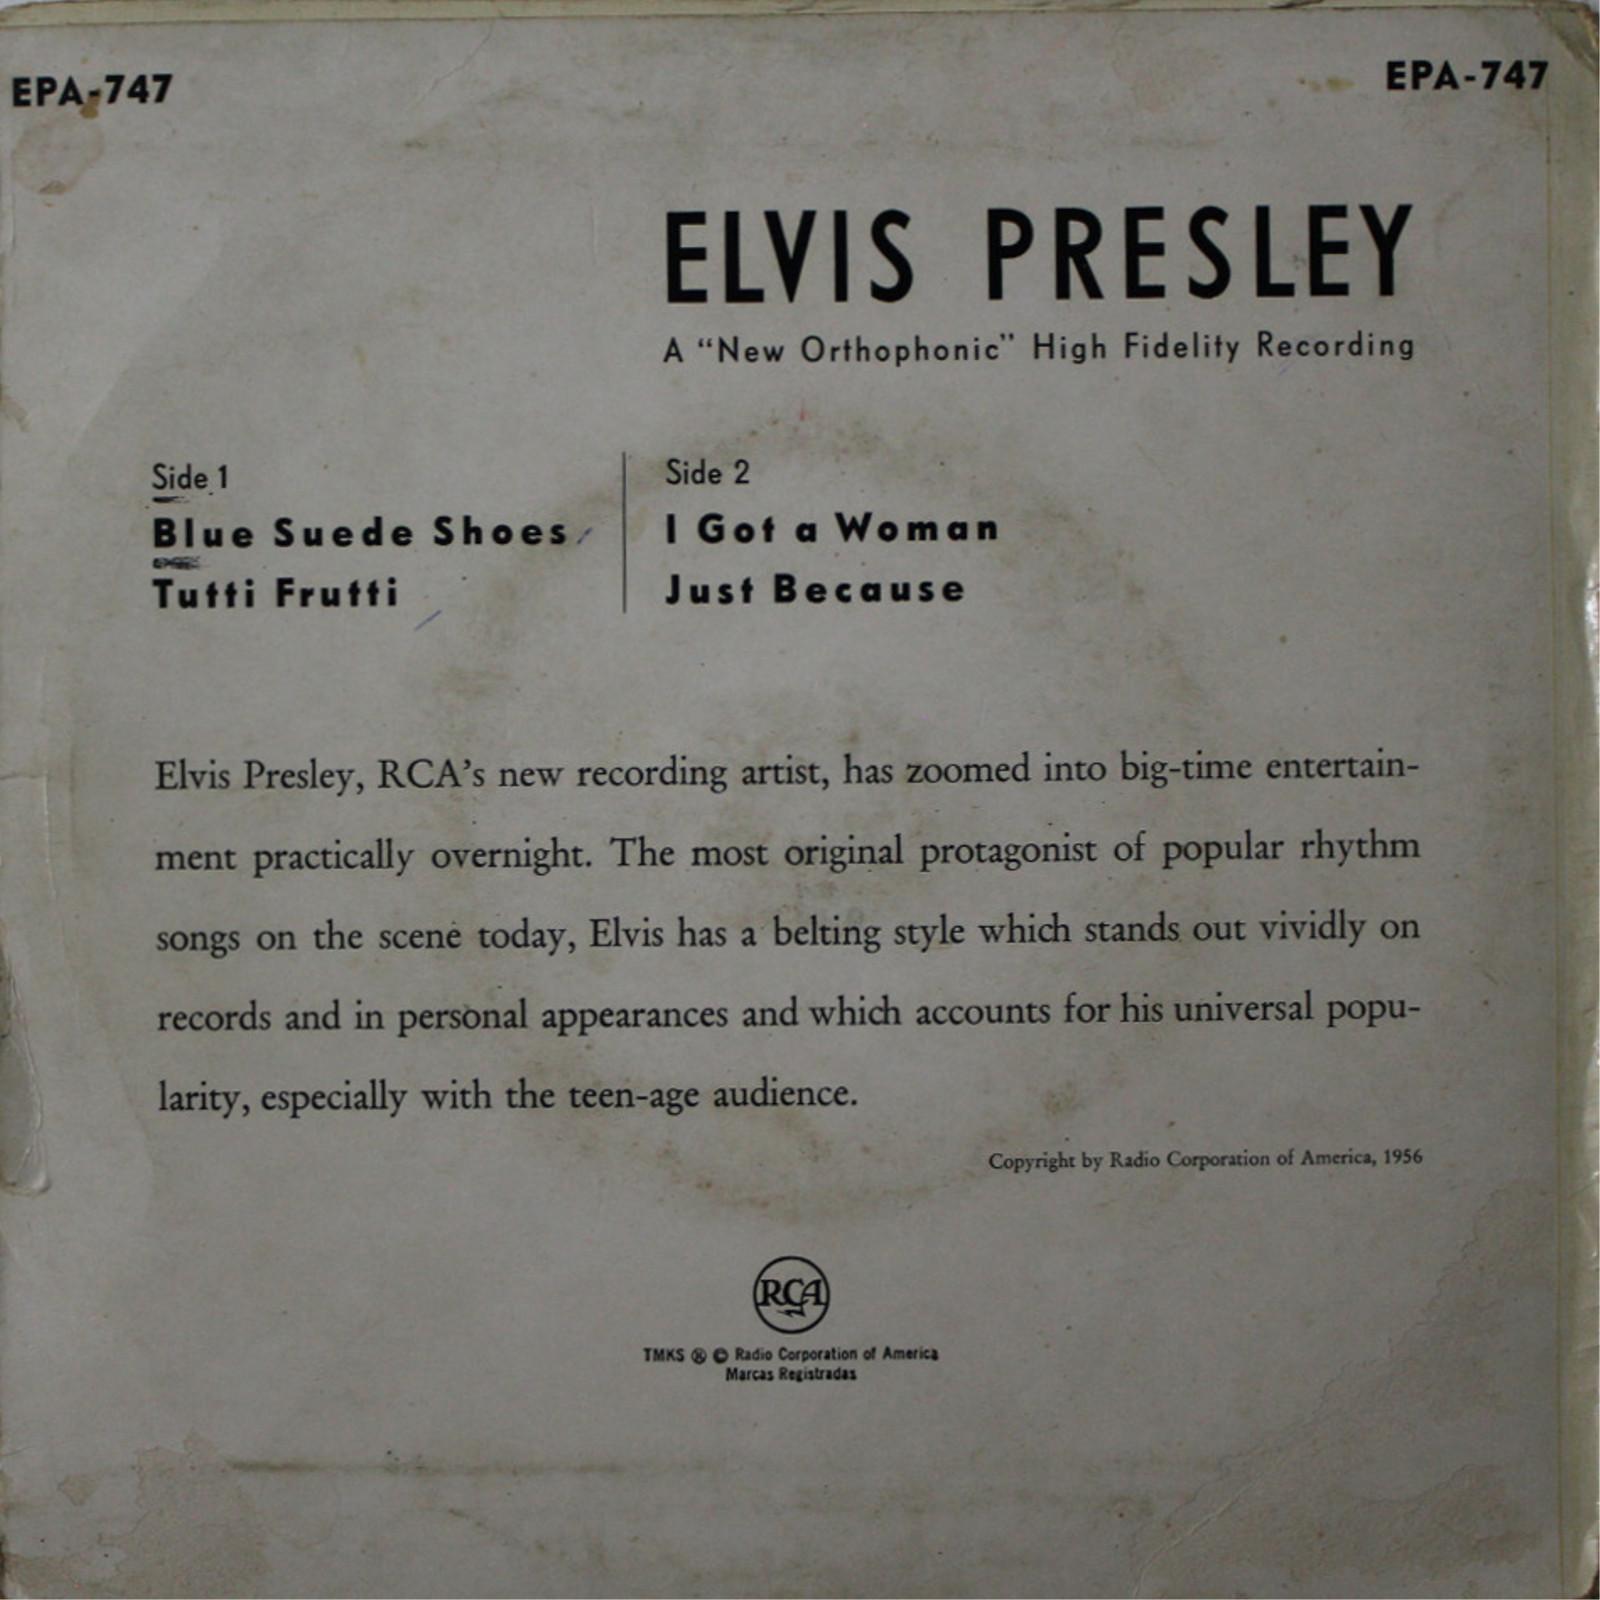 ELVIS PRESLEY Epa747byzjj1